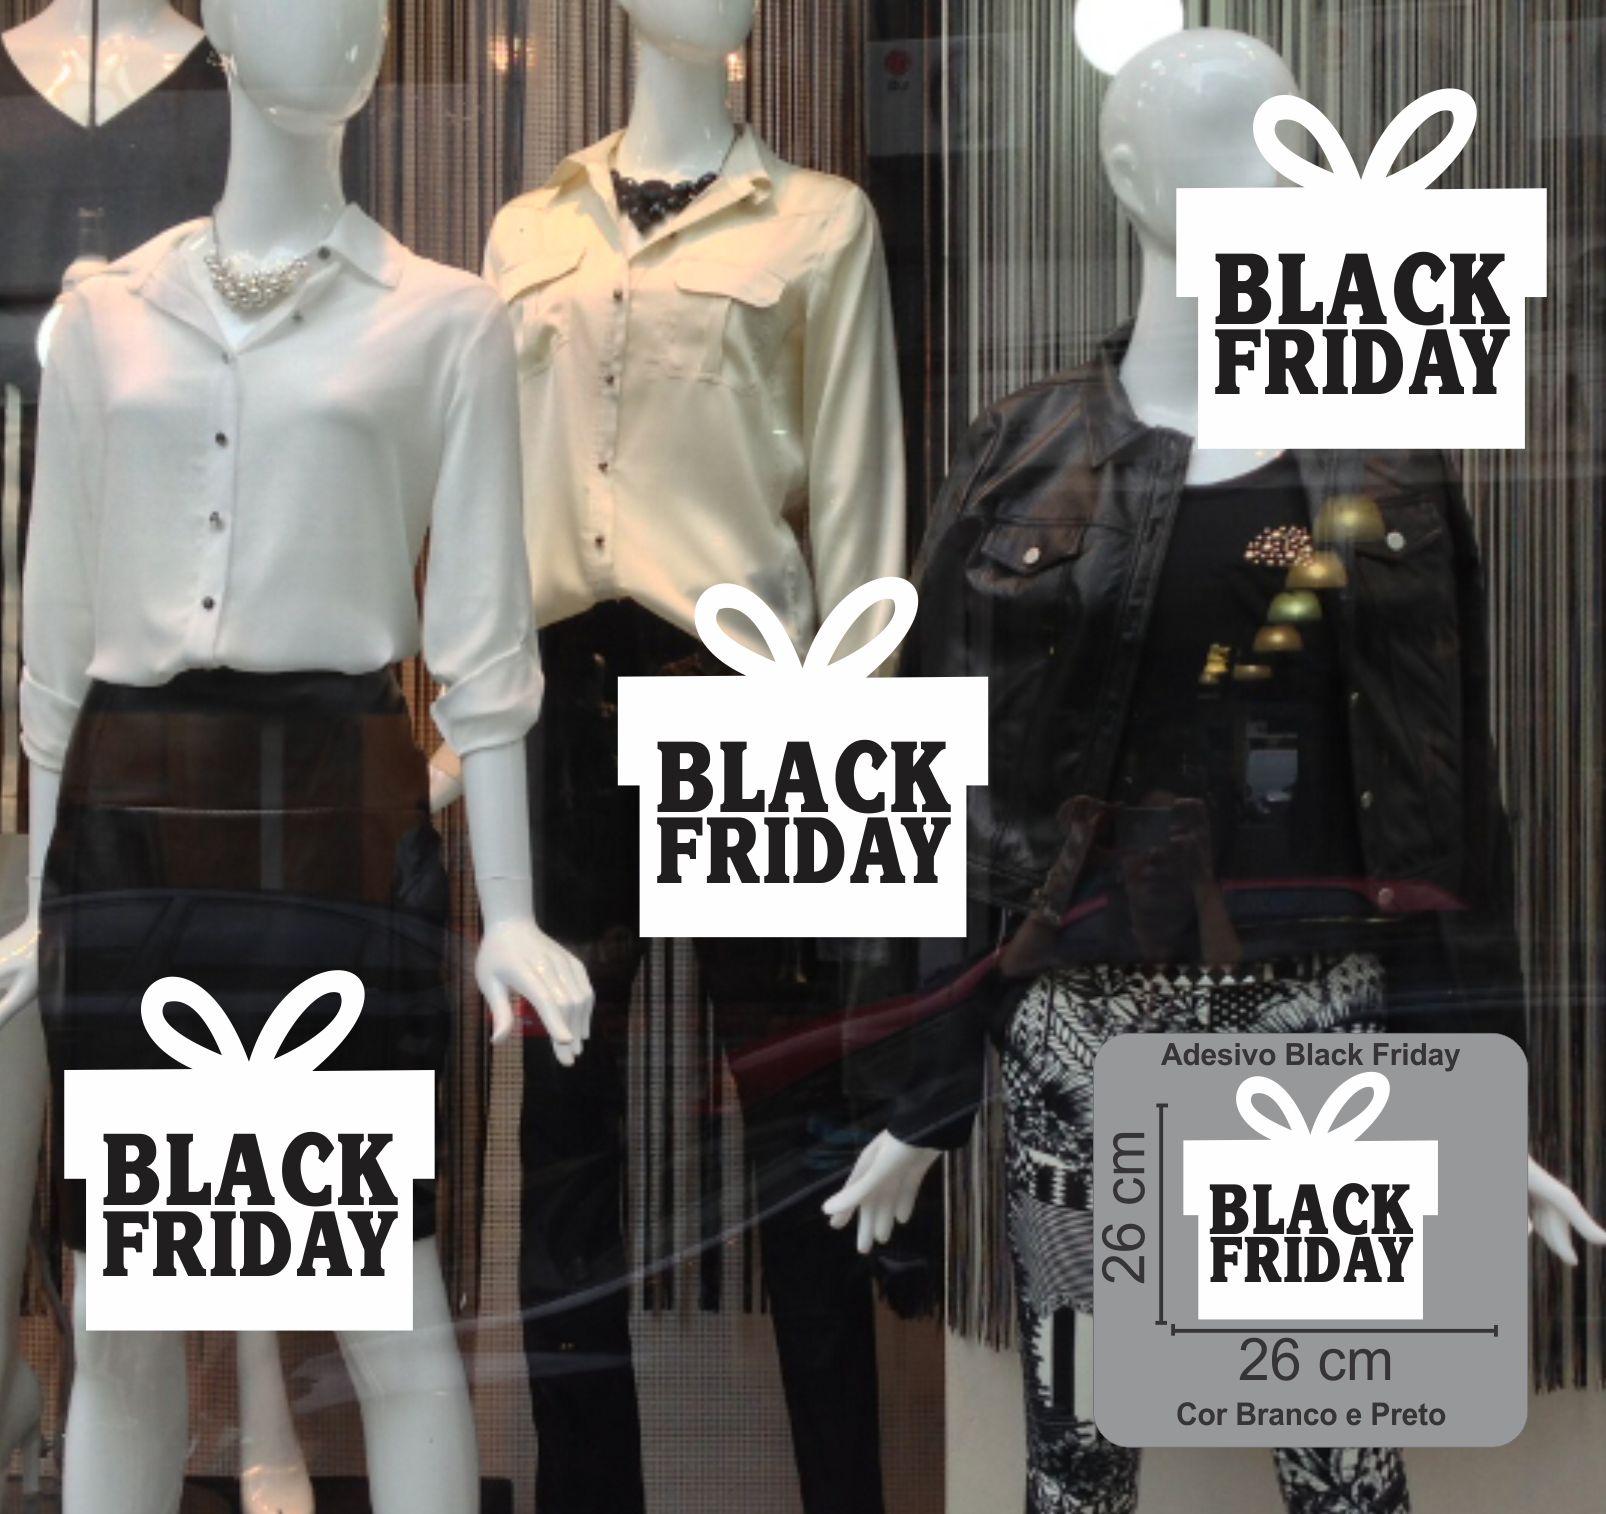 adesivo decorativo black friday loja viviane brindes design elo7. Black Bedroom Furniture Sets. Home Design Ideas